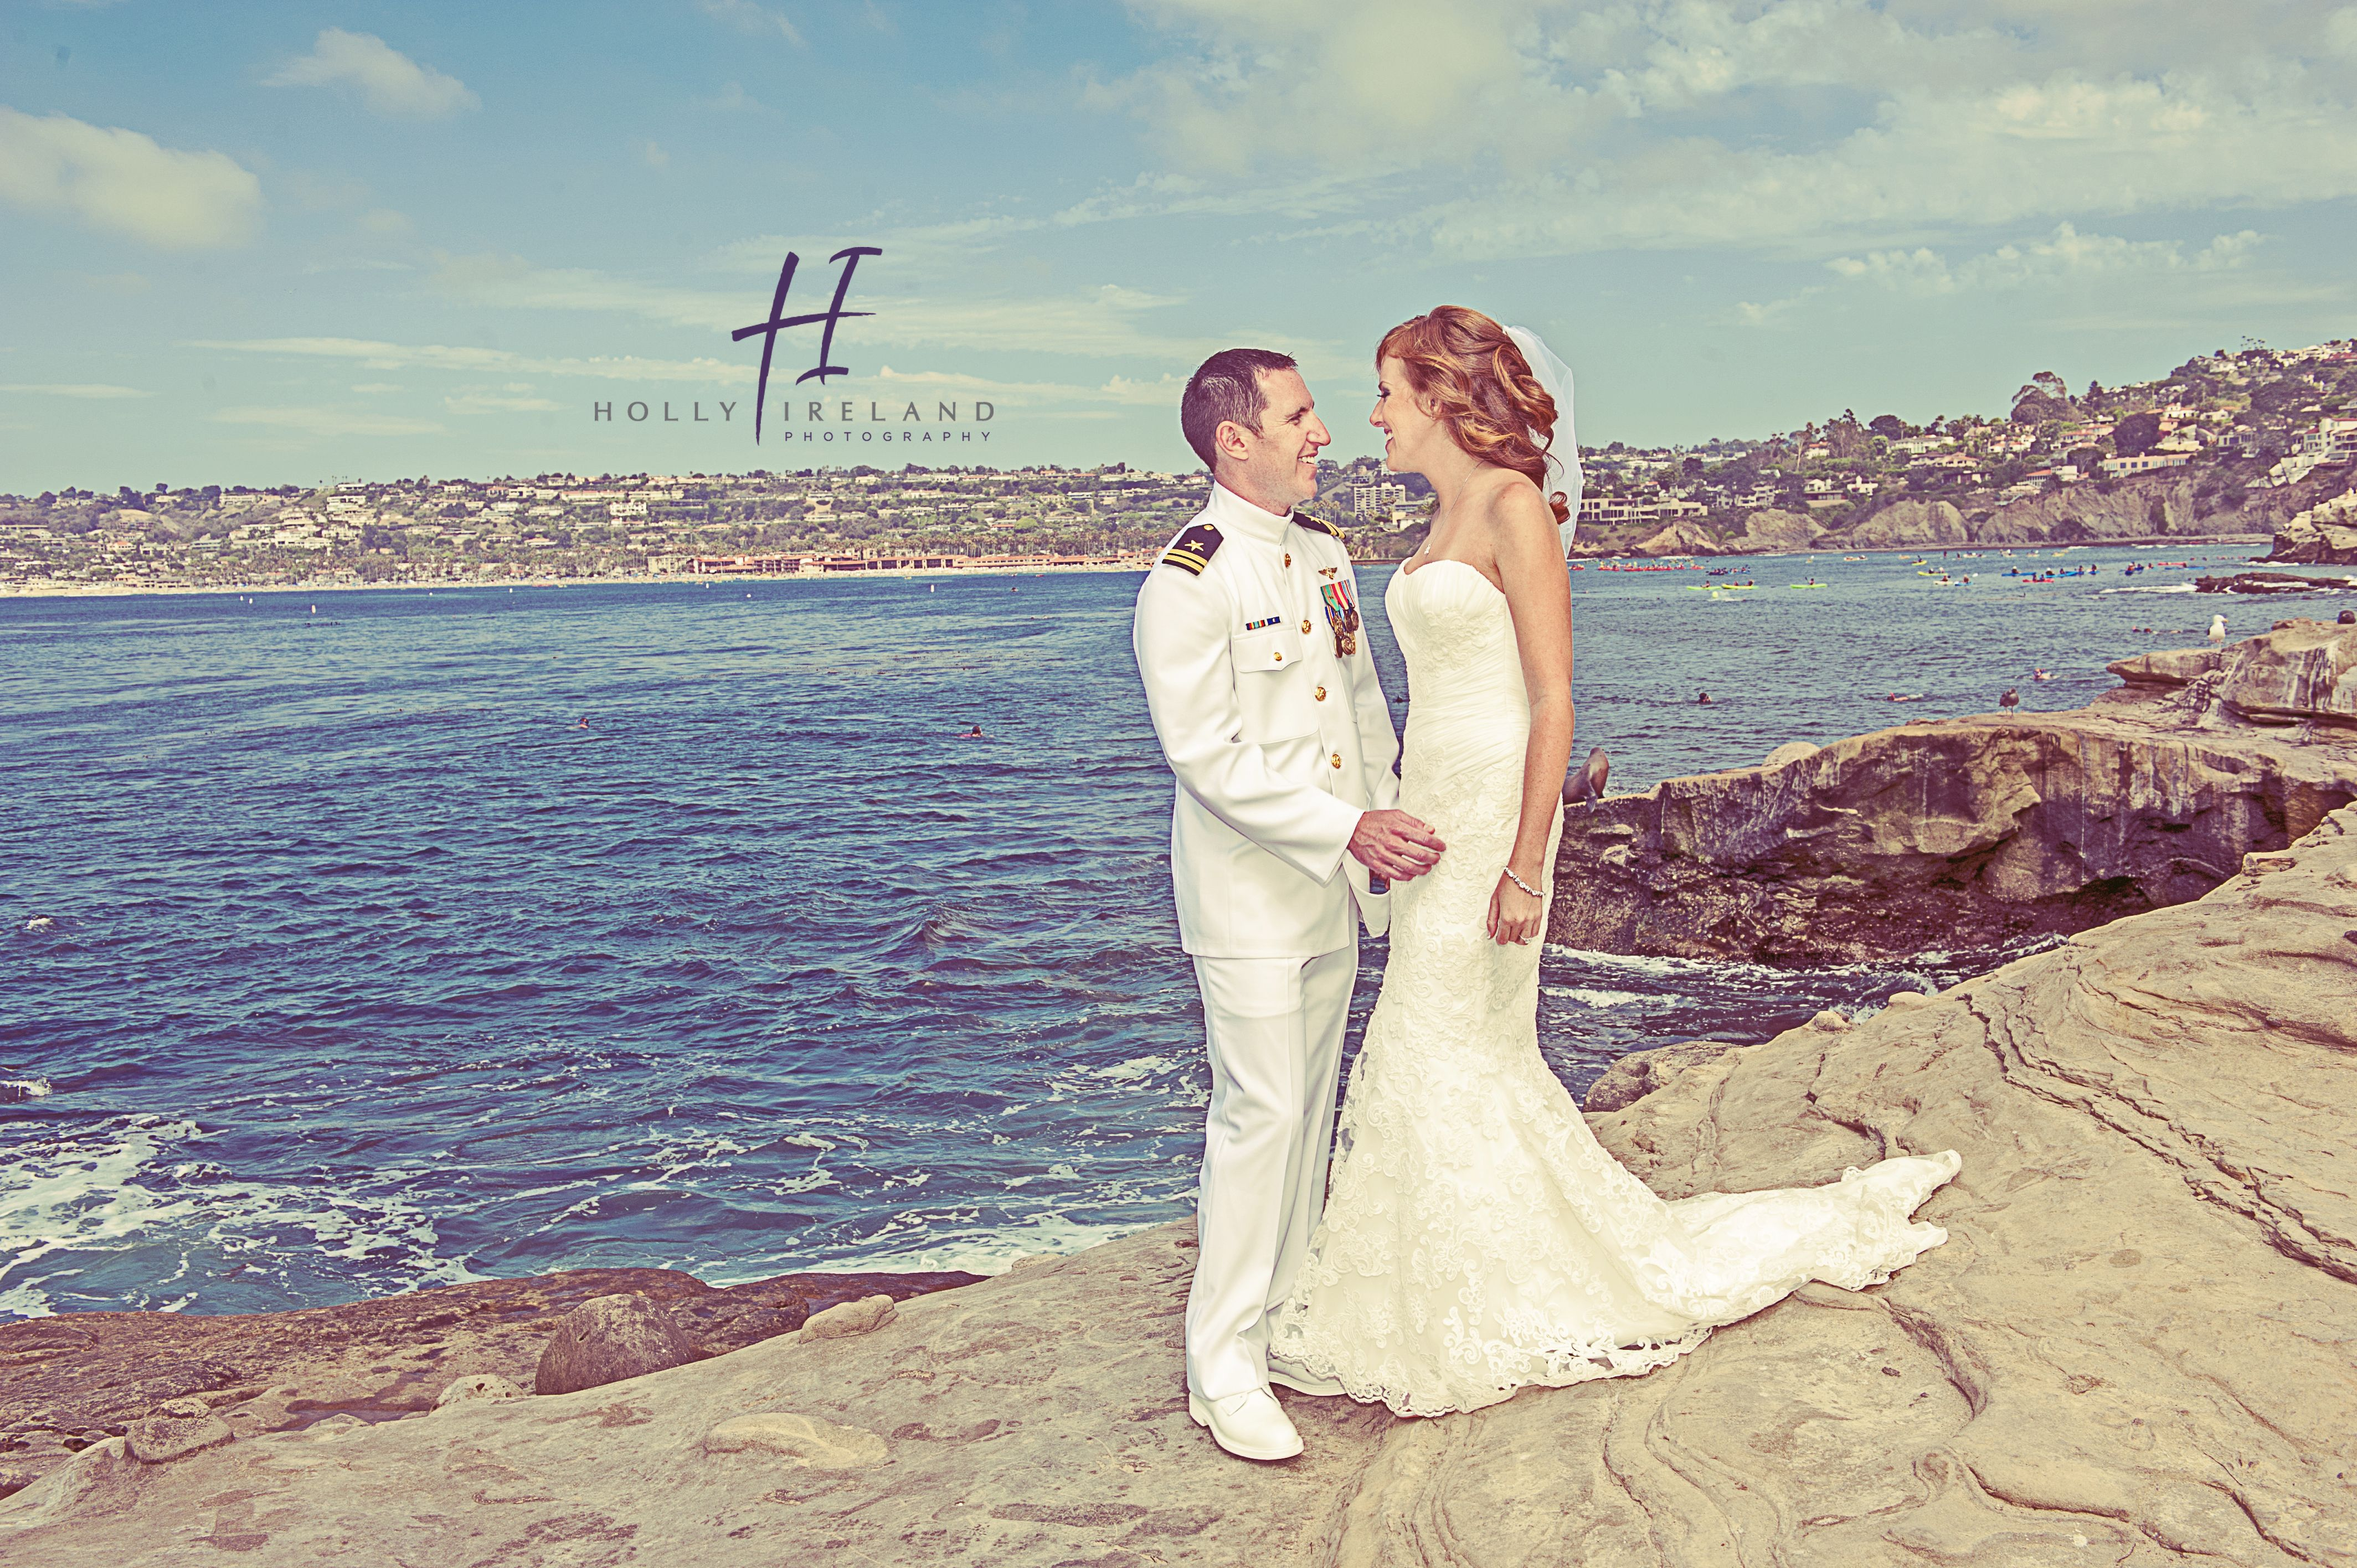 San Diego Wedding Photos taken at La Jolla Cove Suites | WEDDING ...